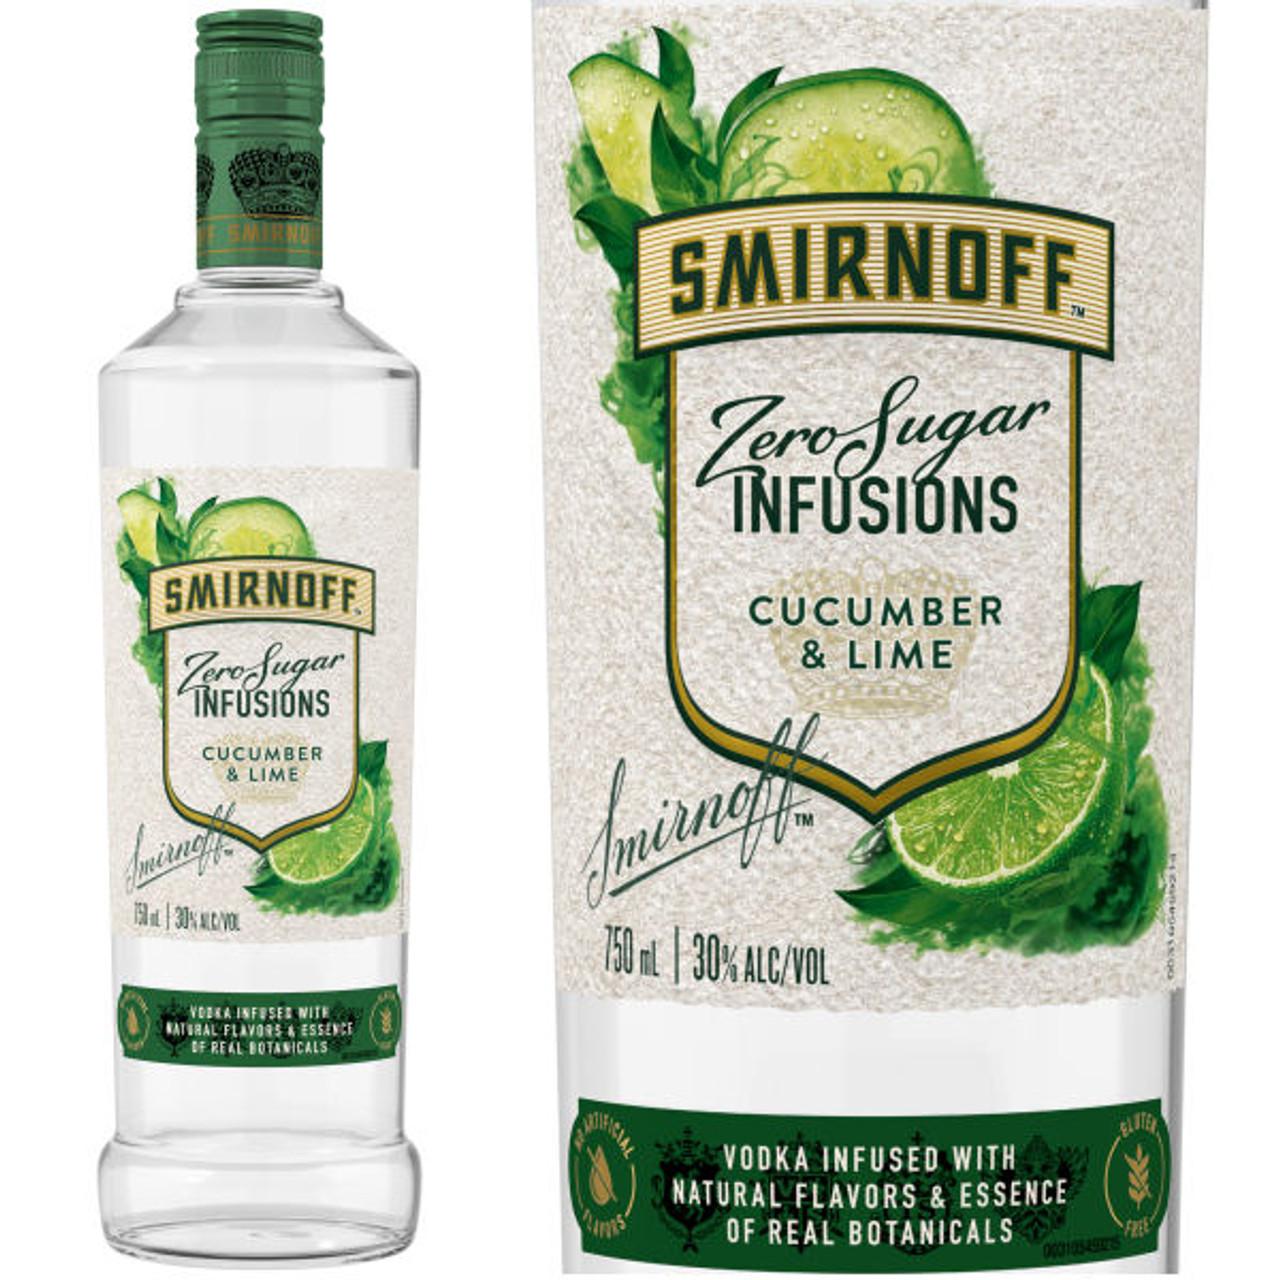 Smirnoff Infusions Zero Sugar Cucumber & Lime Vodka 750ml